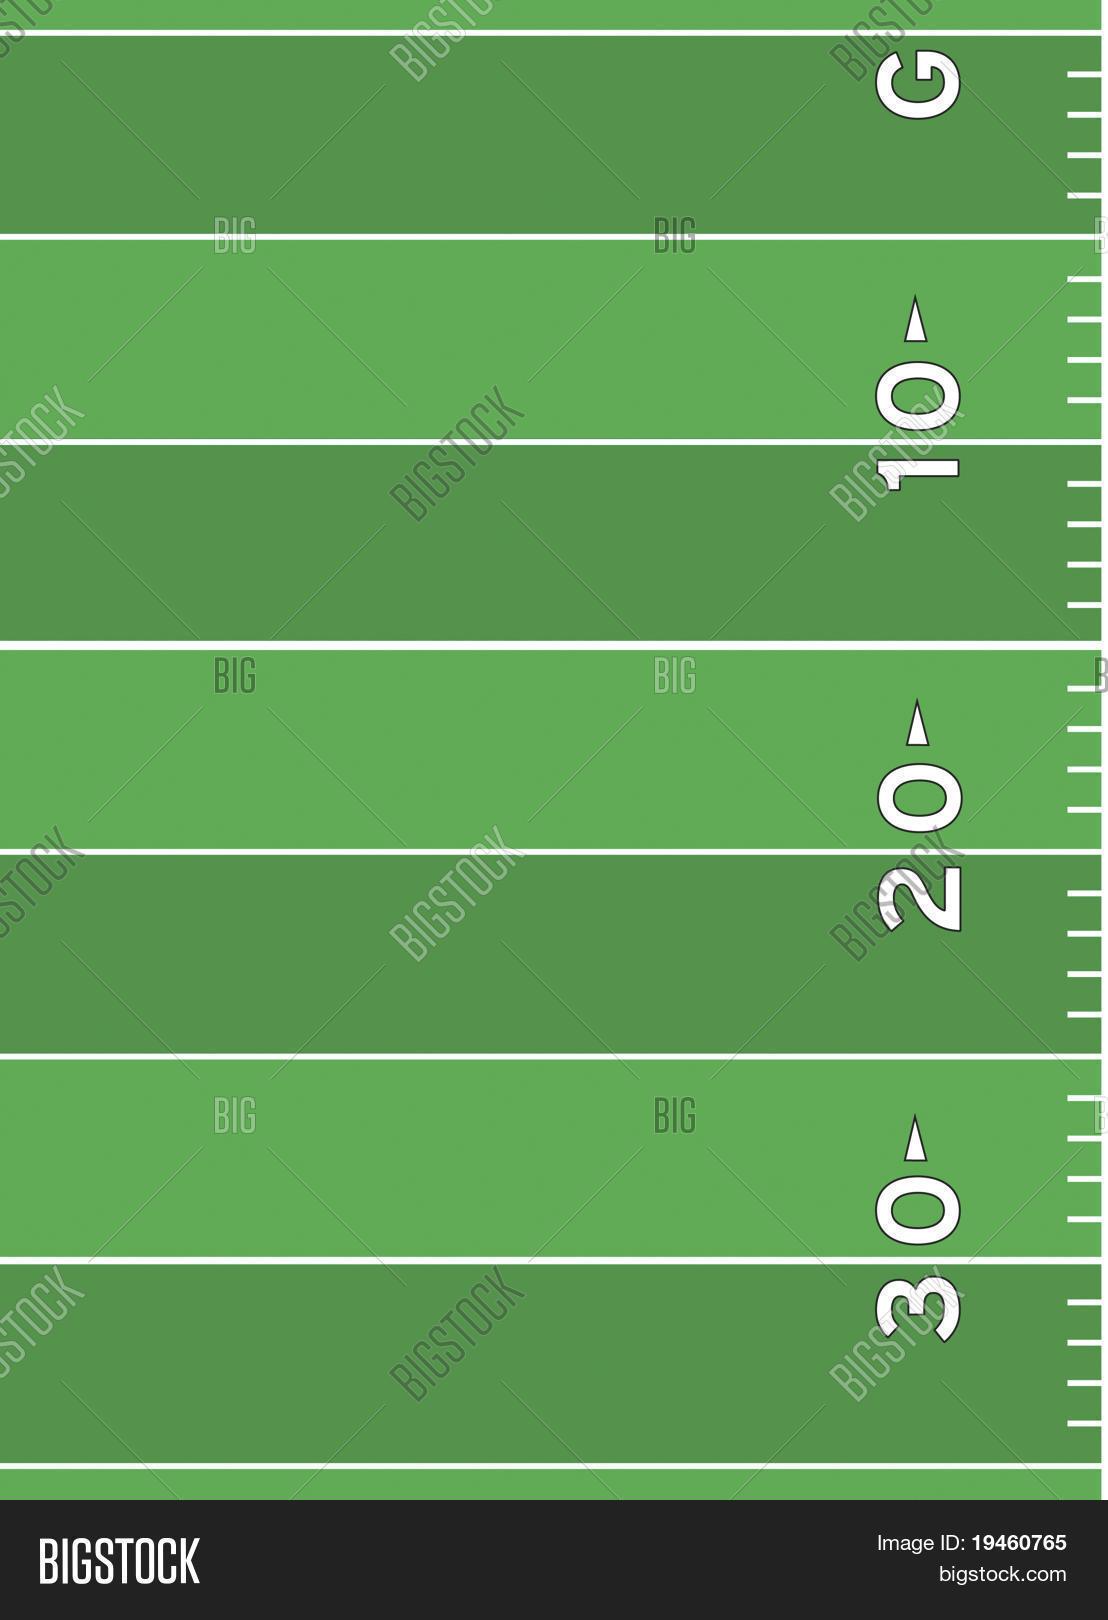 Football Field Markings Stock Vector Amp Stock Photos Bigstock